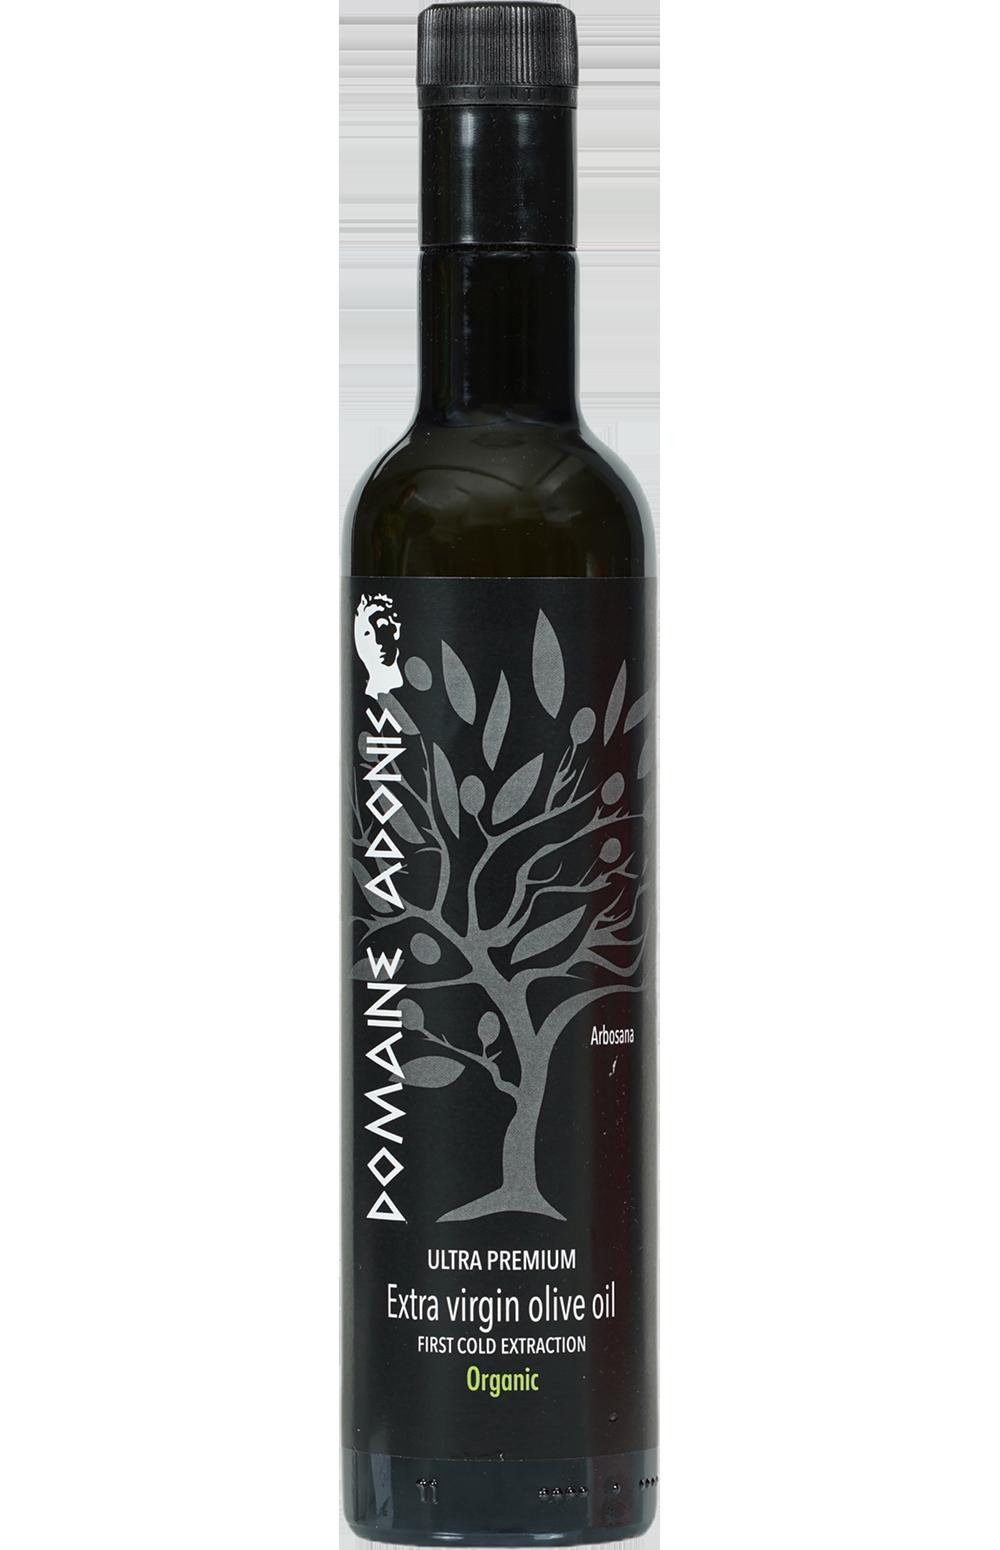 Domaine Adonis Organic Arbosana